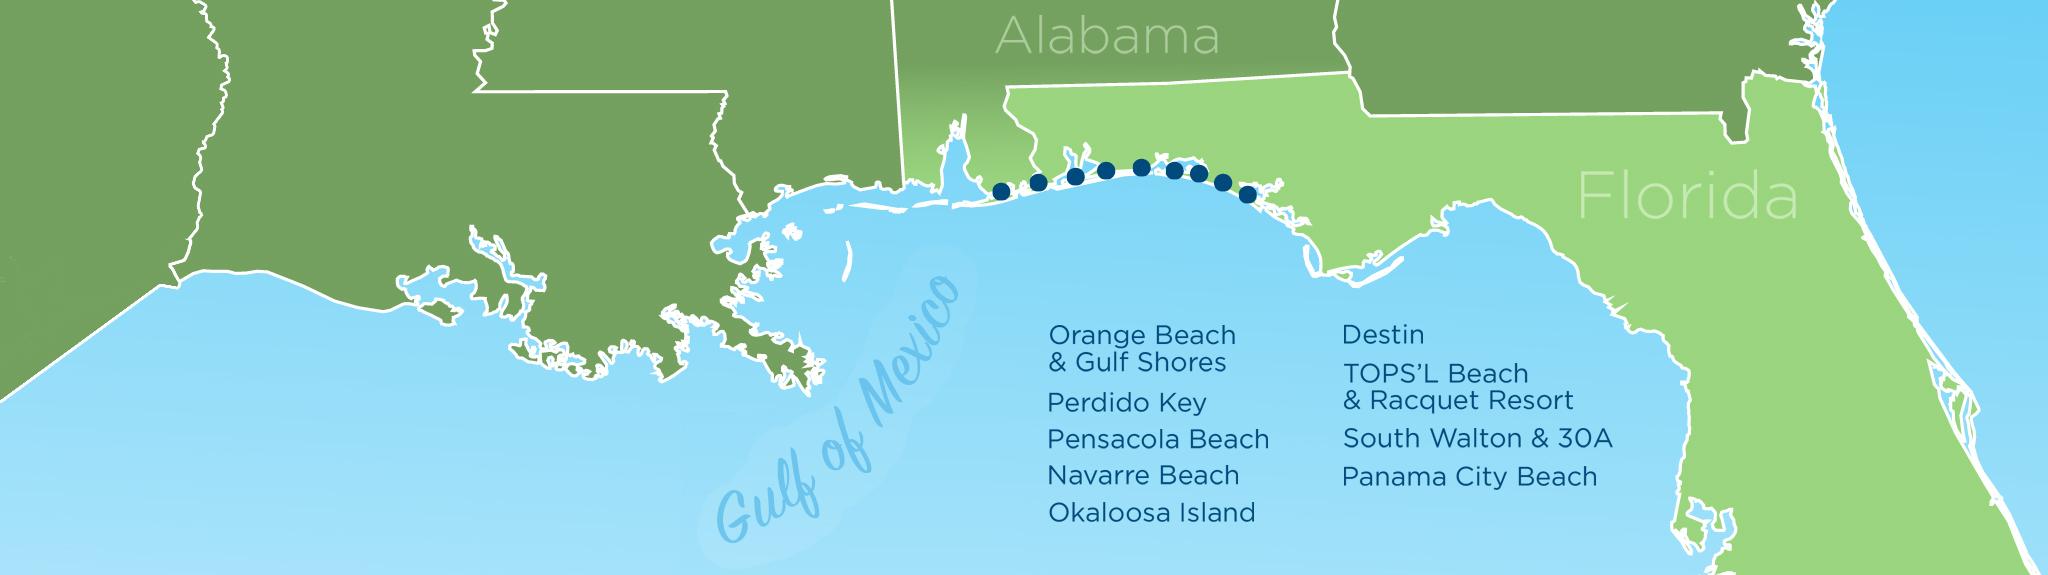 Resortquest Real Estate | Nw Fl & Al Gulf Coast Condos And Homes For - Panama City And Destin Florida Map